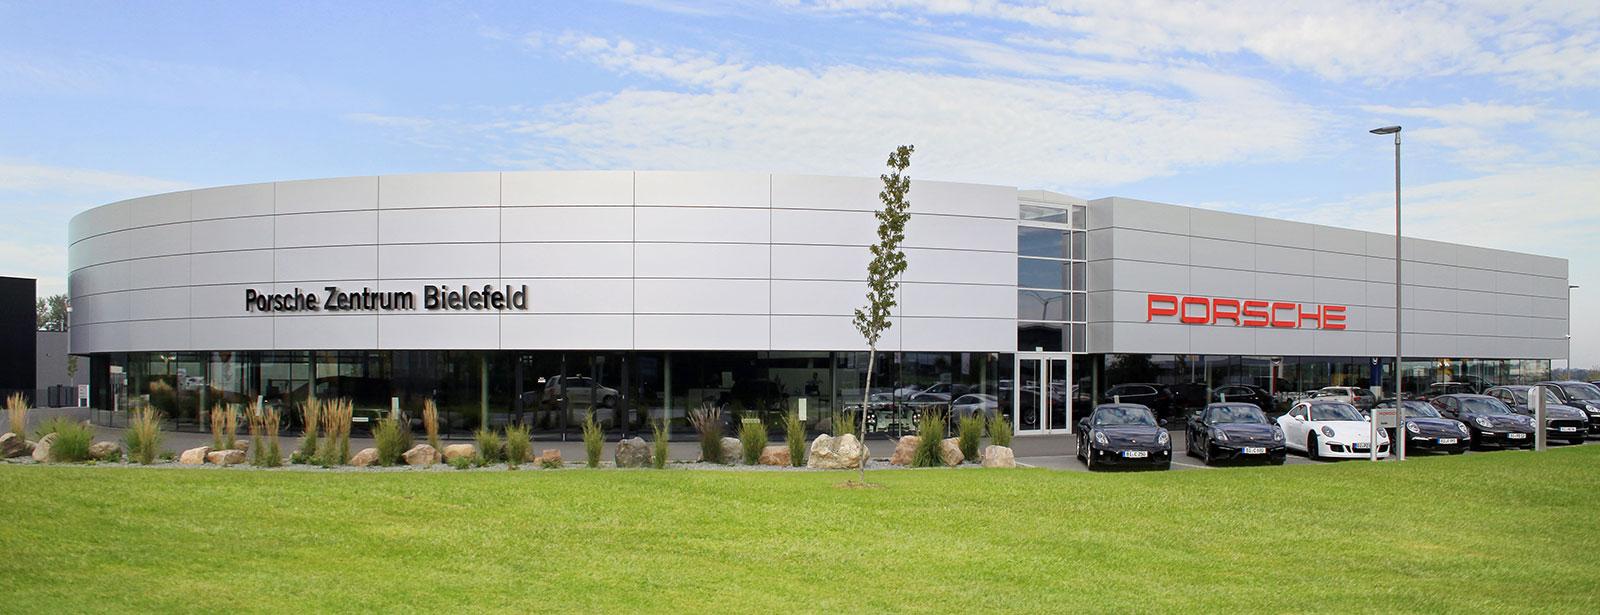 Porsche Centre Bielefeld